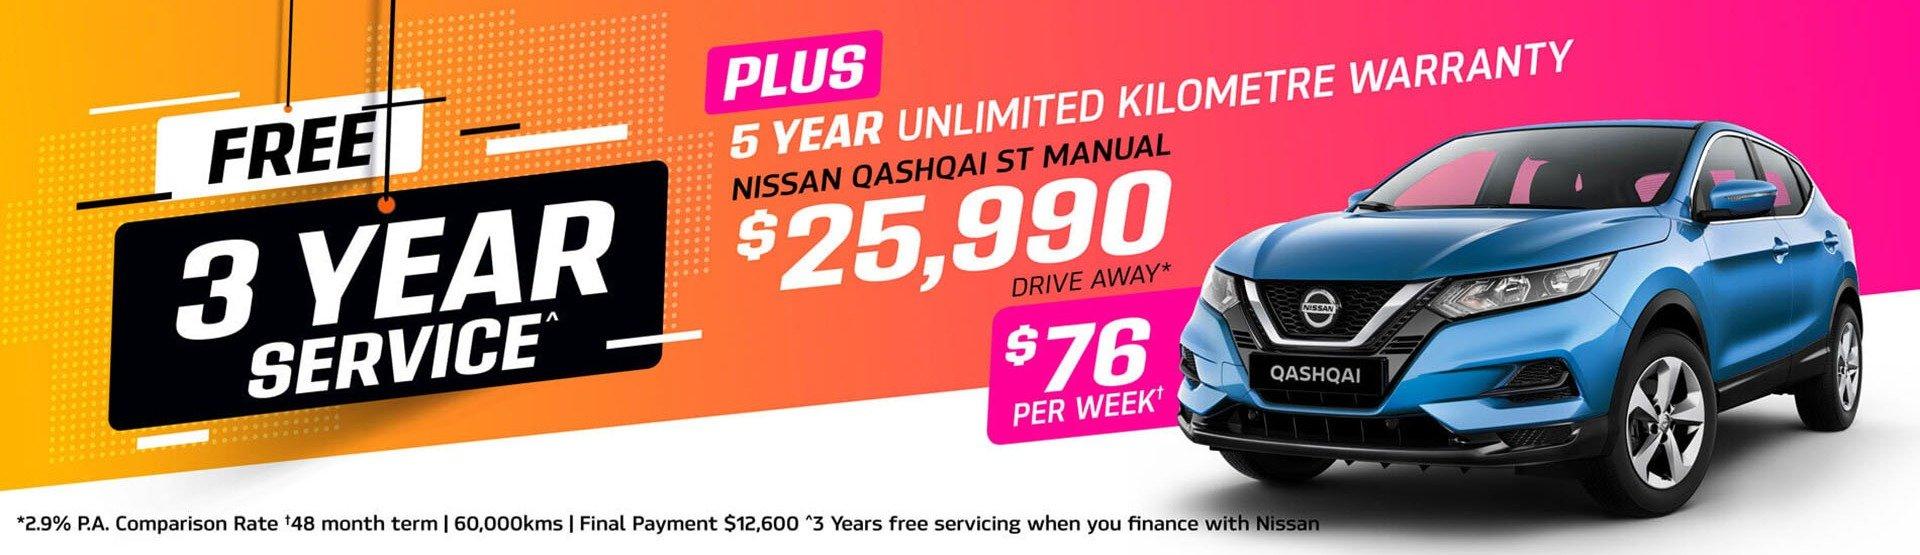 Parry NQ Nissan Qashqai Offer